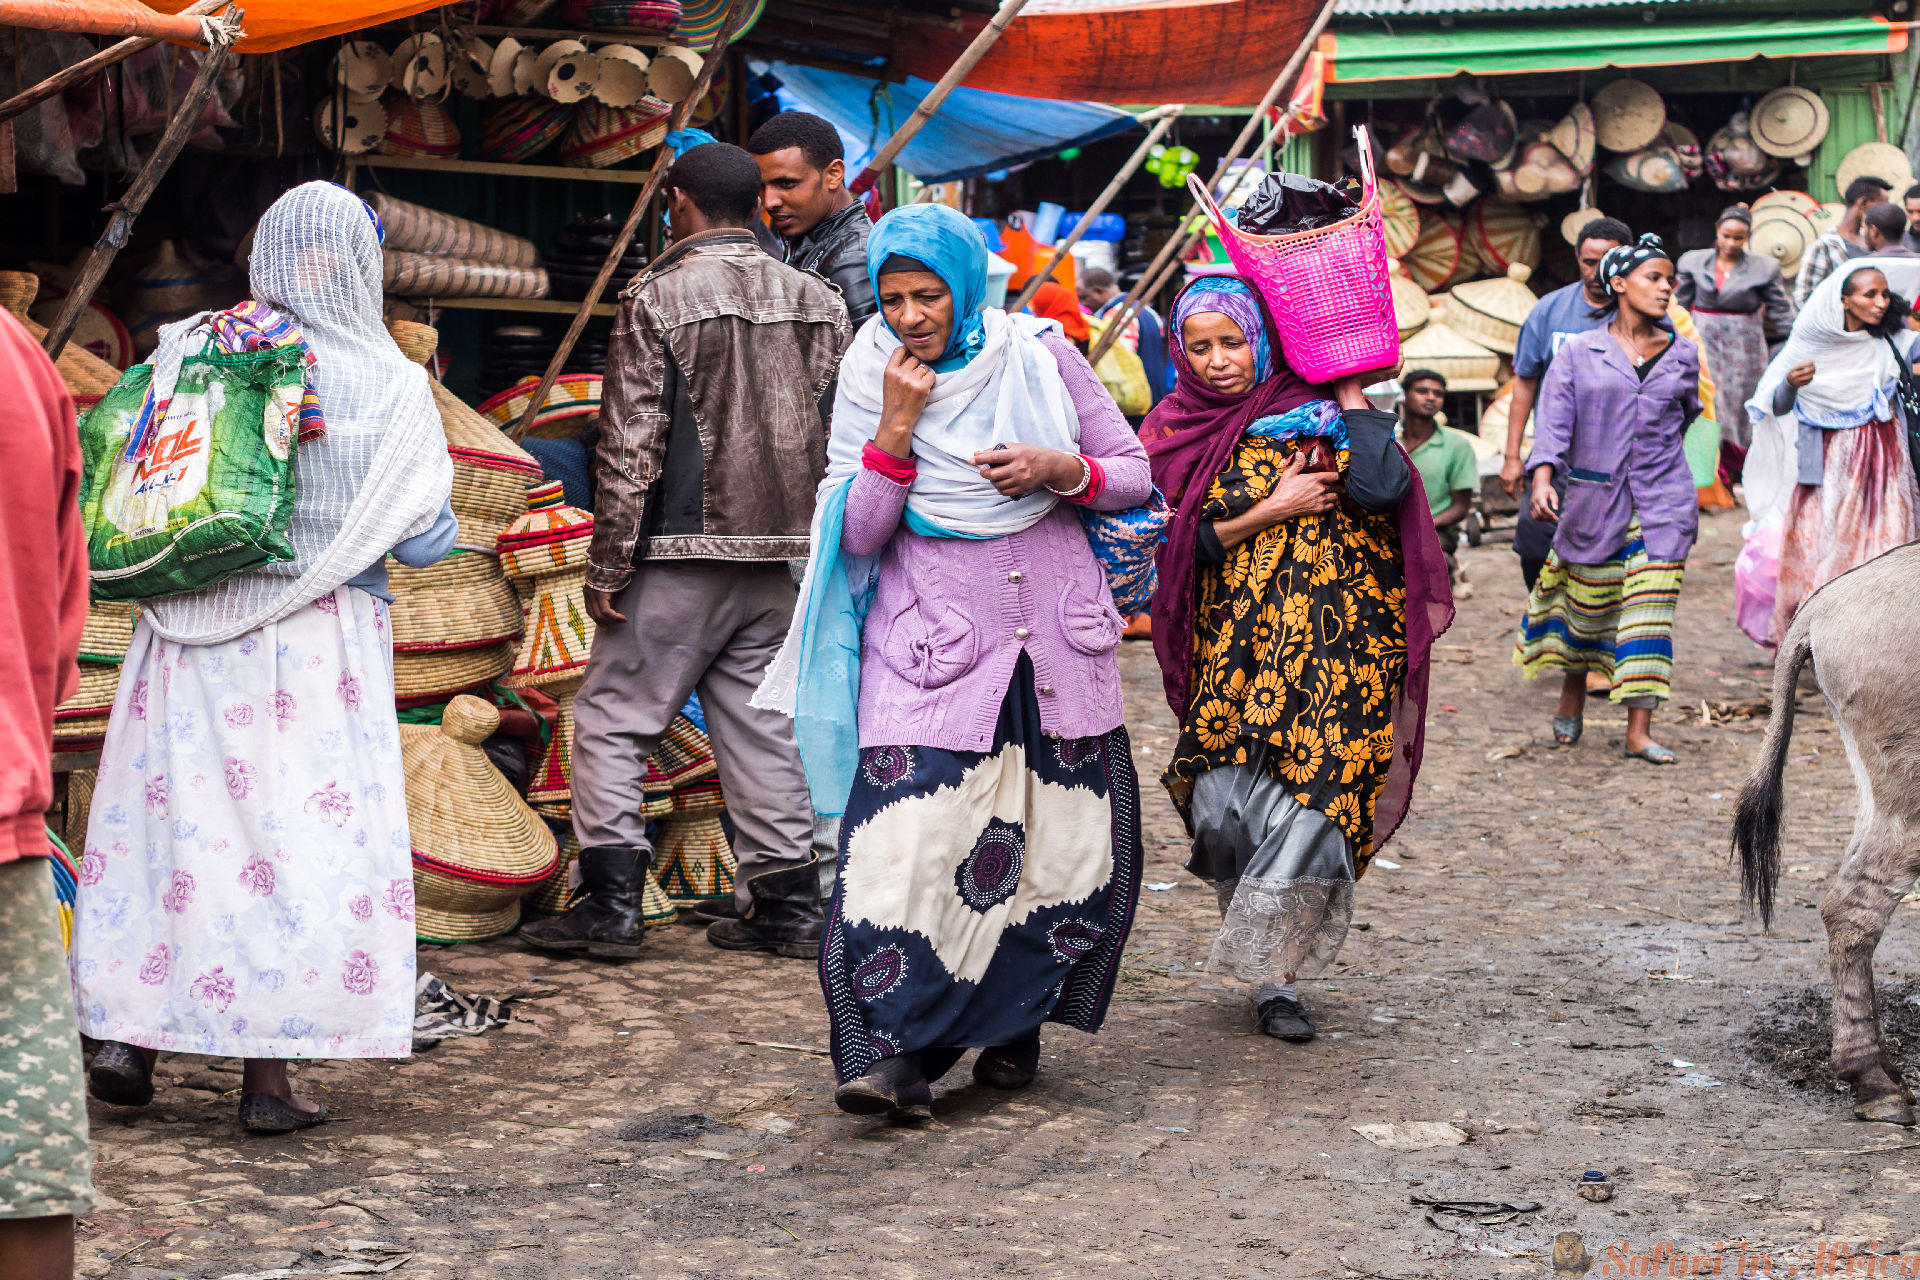 People at Addis Mercato in Addis Abeba, Ethiopia